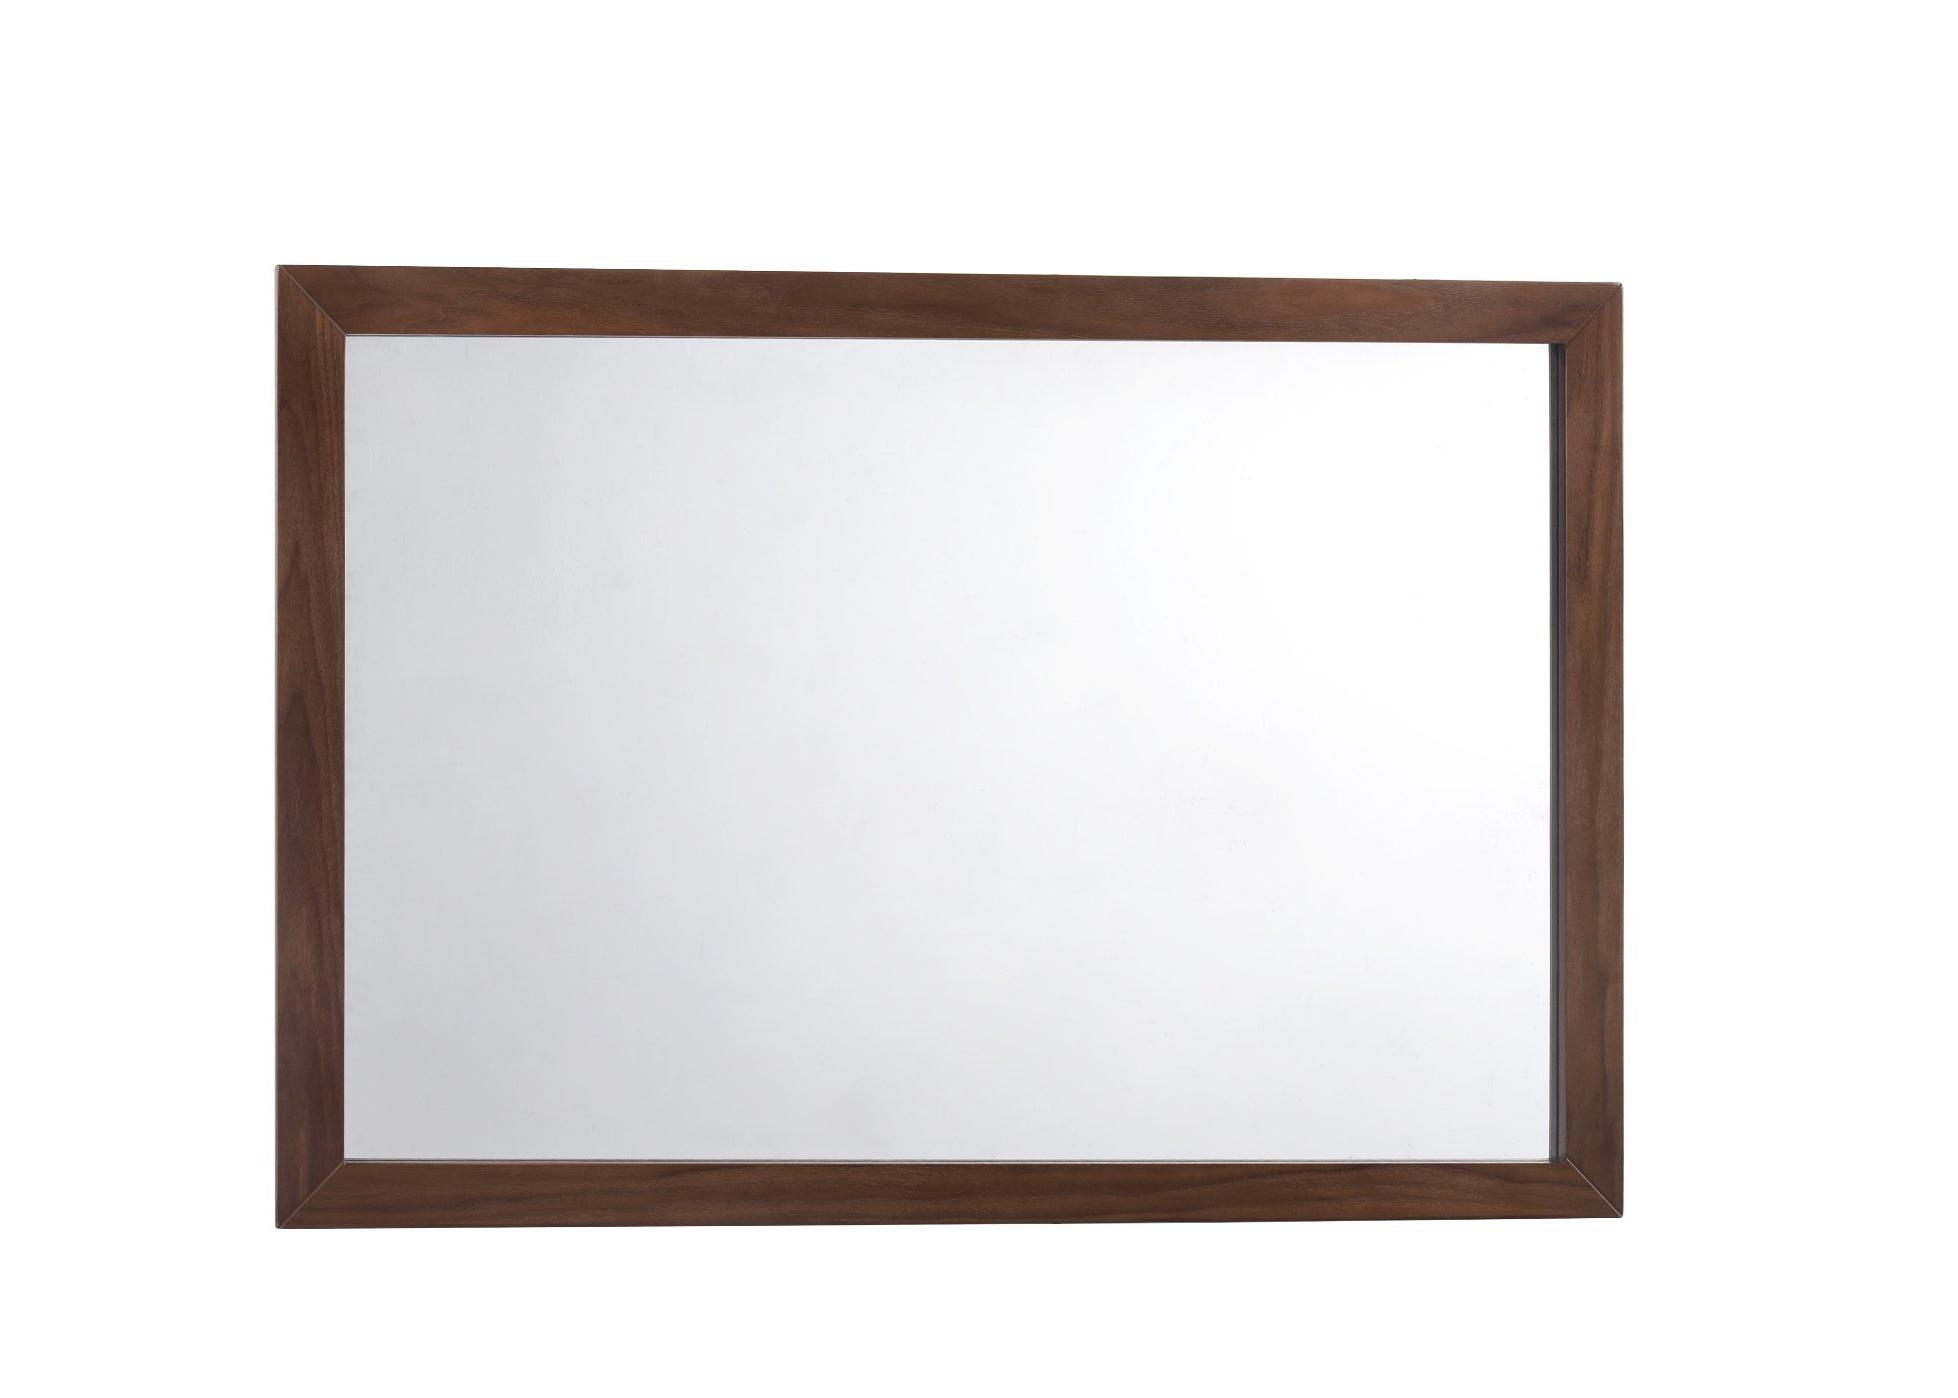 Best And Newest Vassallo Beaded Bronze Beveled Wall Mirrors Within Corrigan Studio Drumnacole Mid Century Bathroom/vanity Mirror (View 6 of 20)